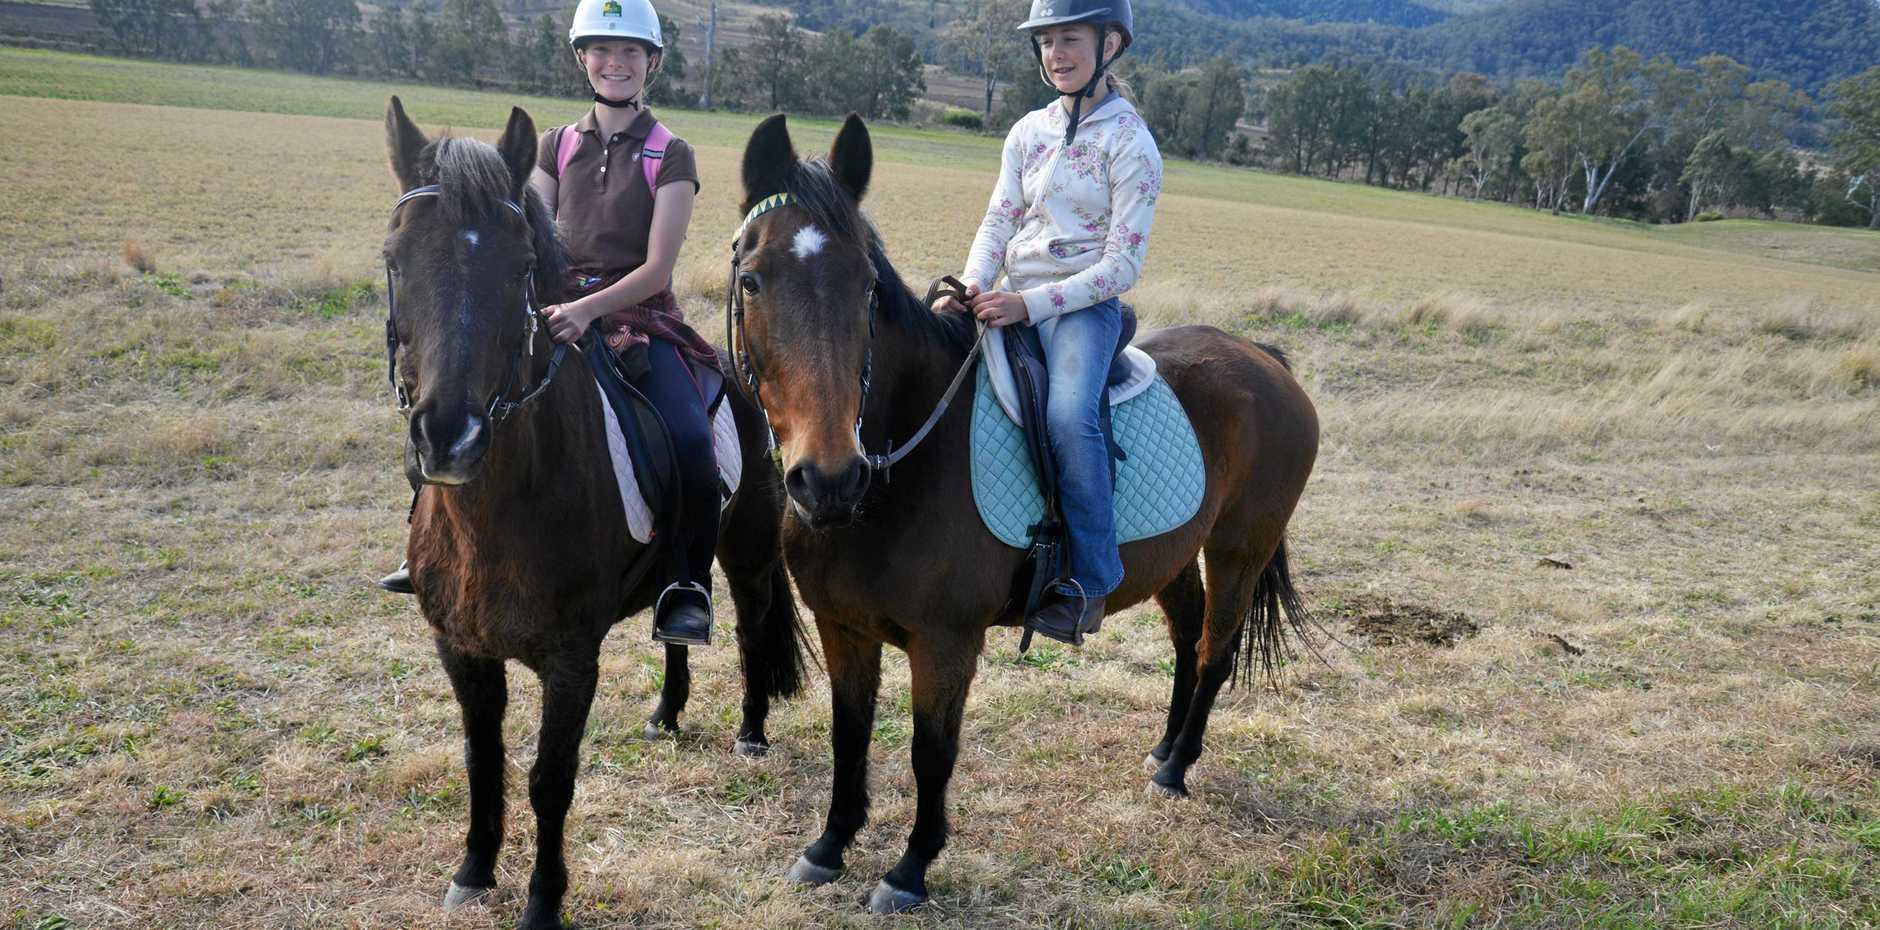 Warwick riders Helena Faa and Indigo Douglas at the end of the Killarney Waddle, Saddle and Pedal trek.